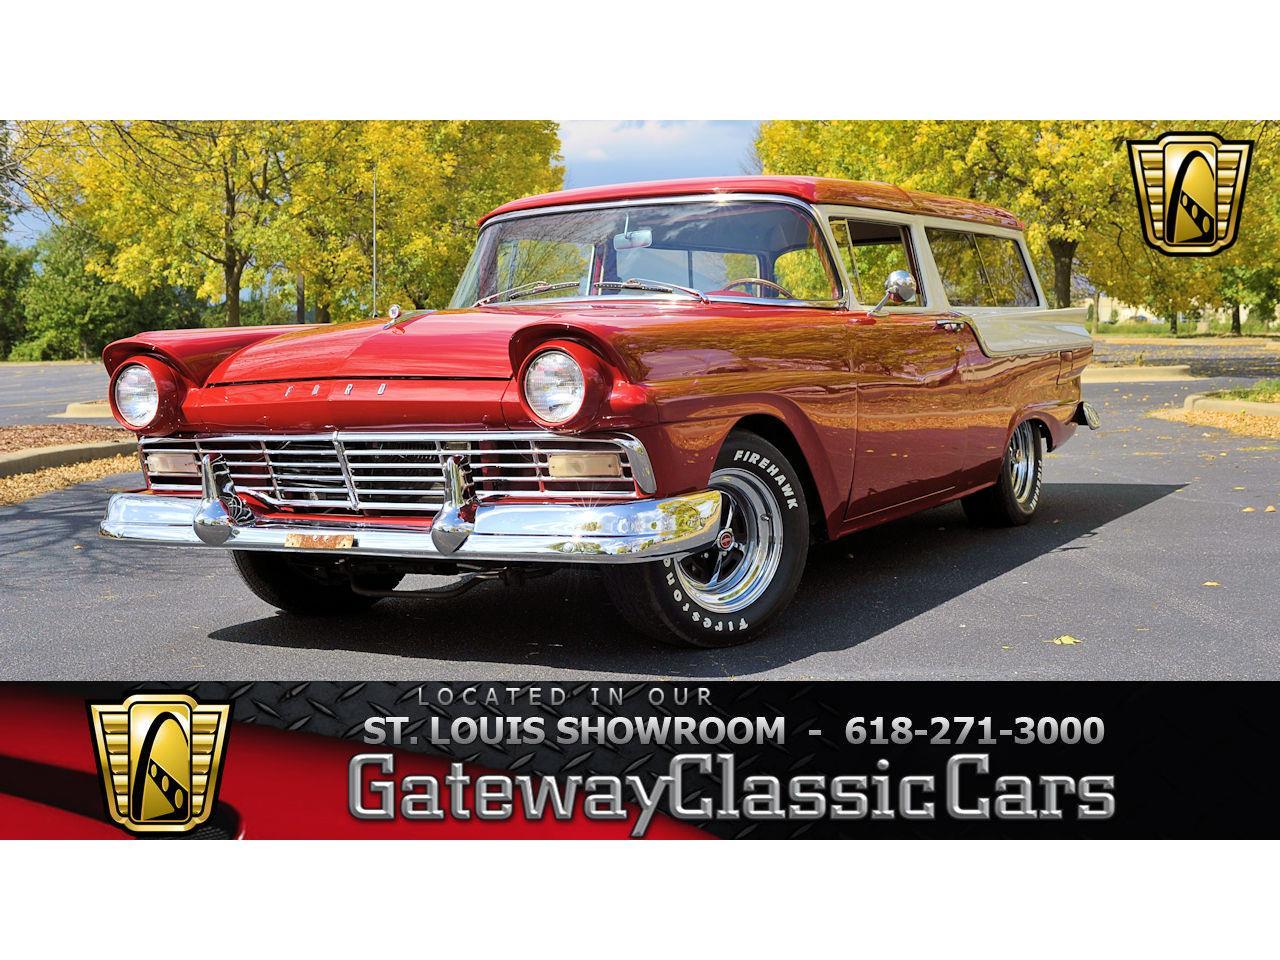 For Sale: 1957 Ford Ranch Wagon in O'Fallon, Illinois